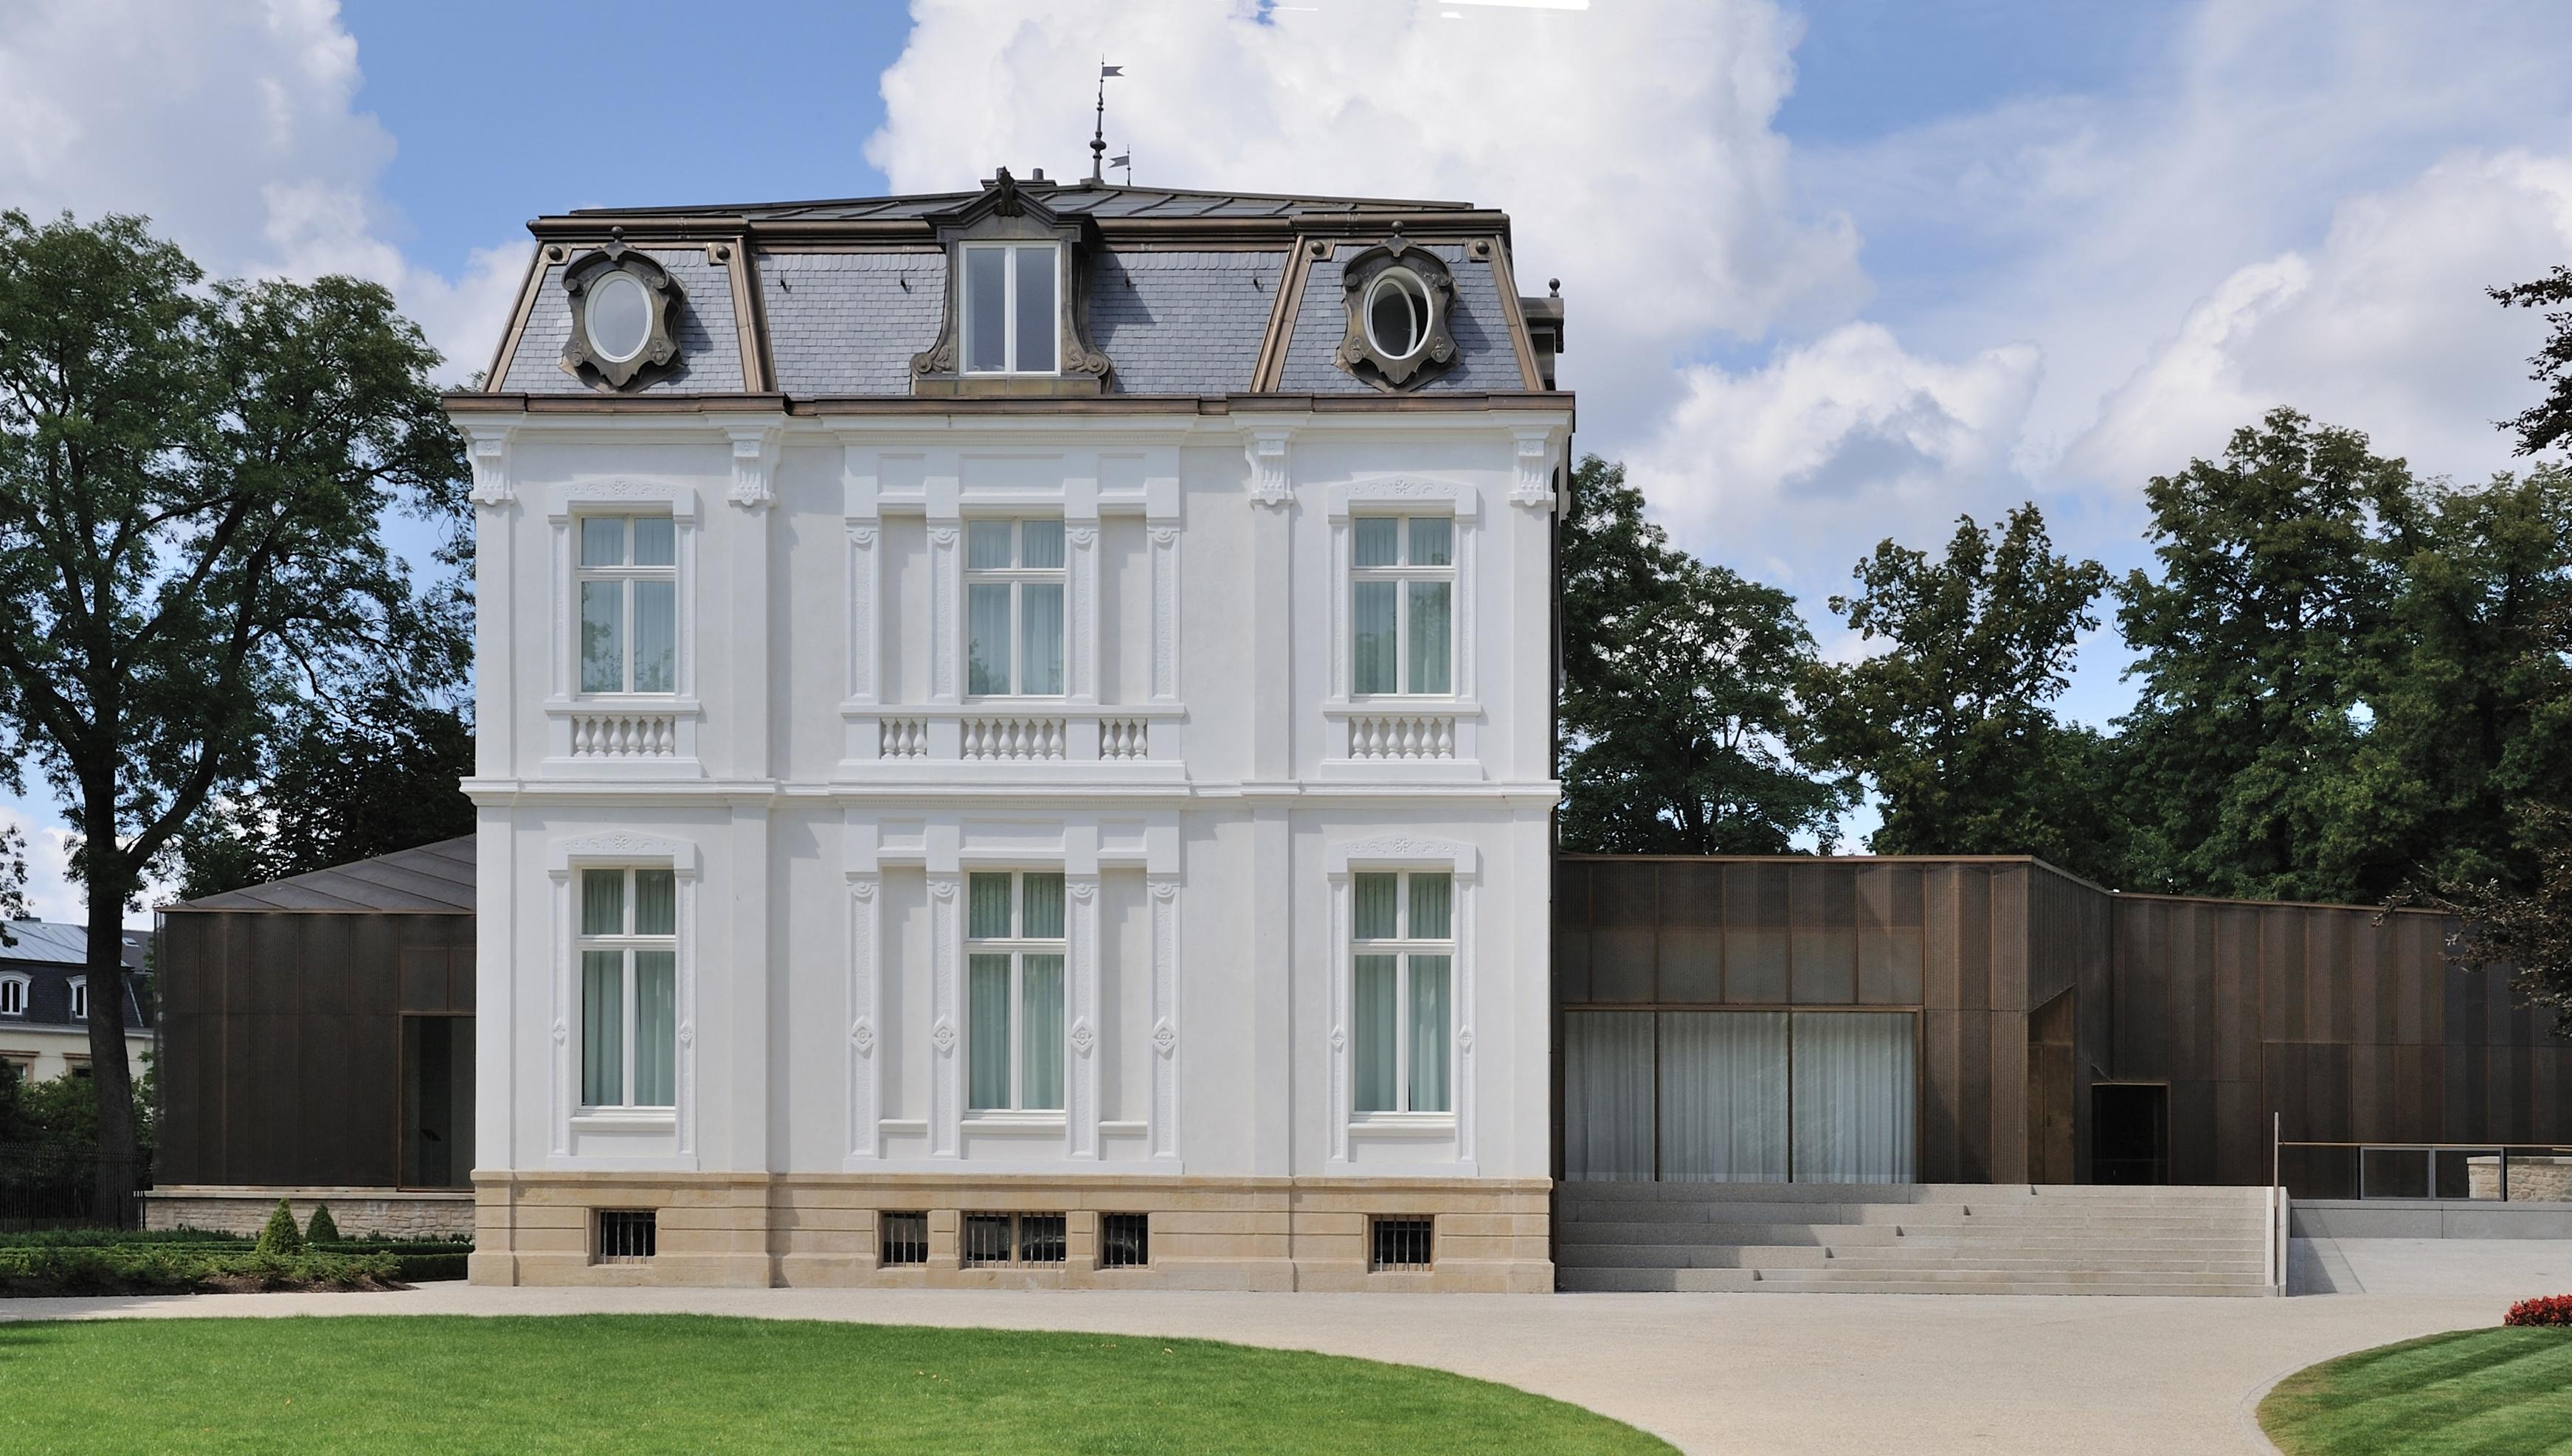 Image of Villa Vauban